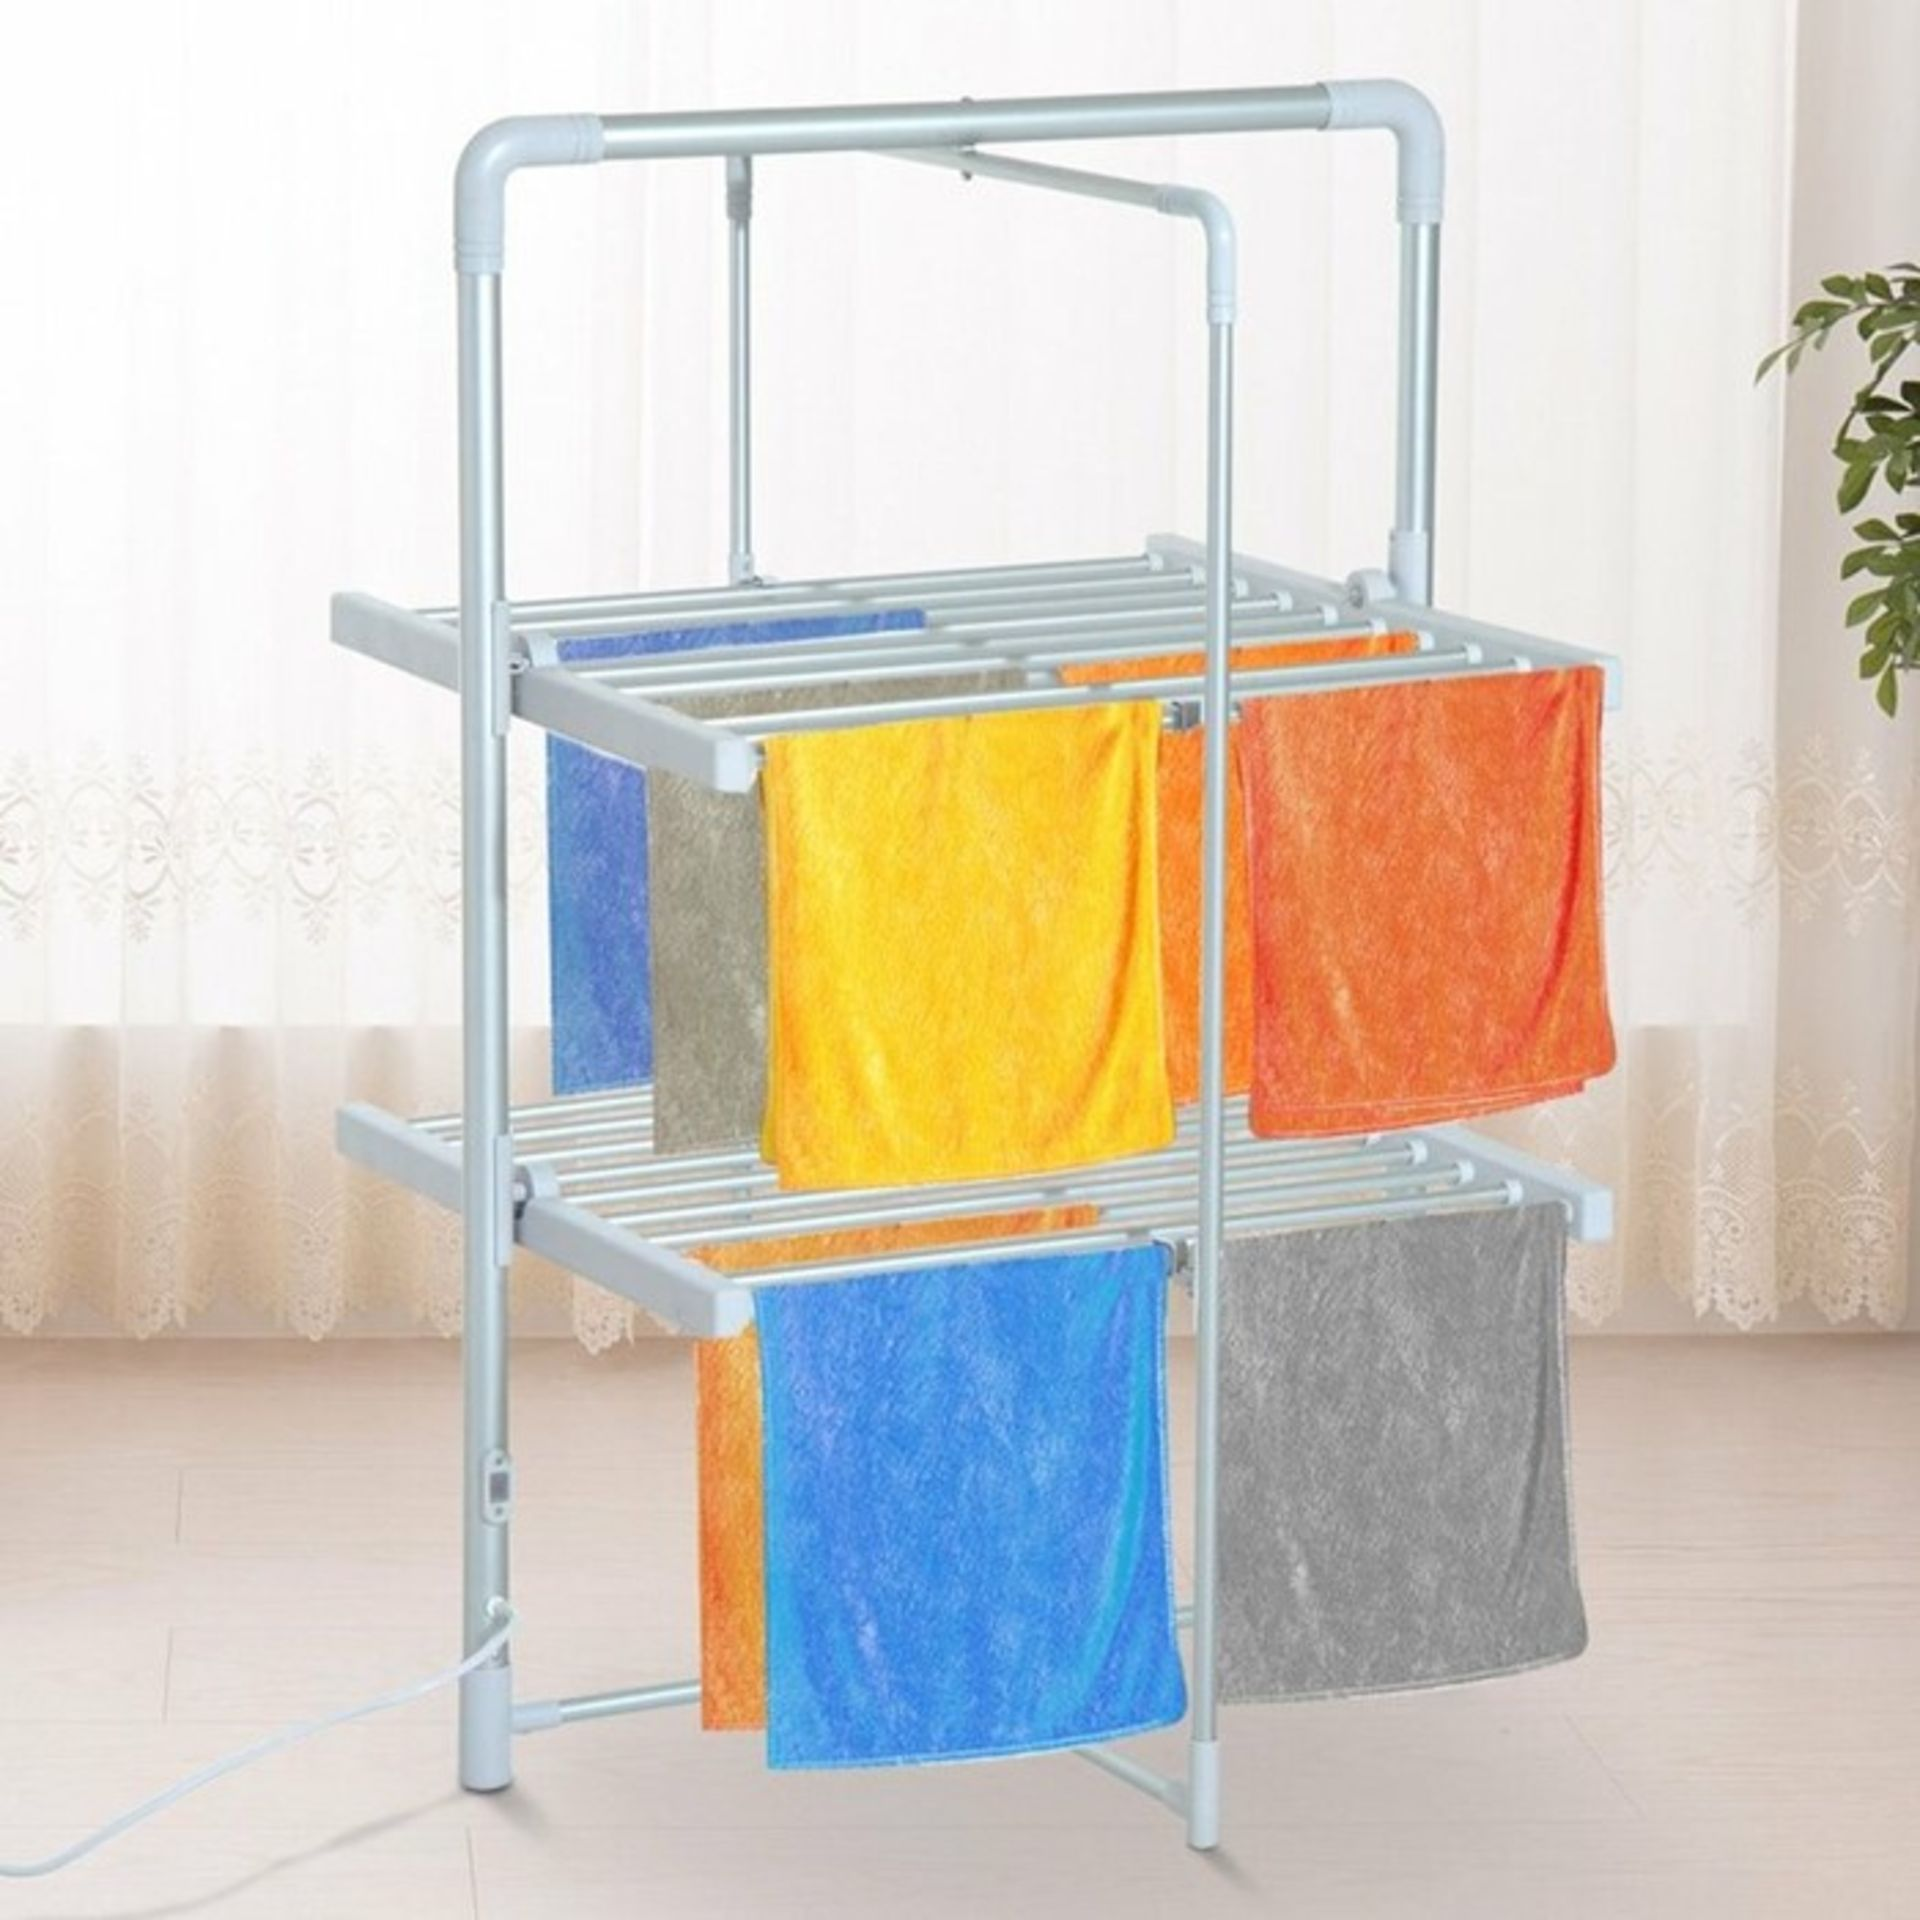 Symple Stuff, Electric 2 Tier Quick Dry Folding Drying Rack - RRP£65.99 (HMCM1932 - 21458/20) 1J